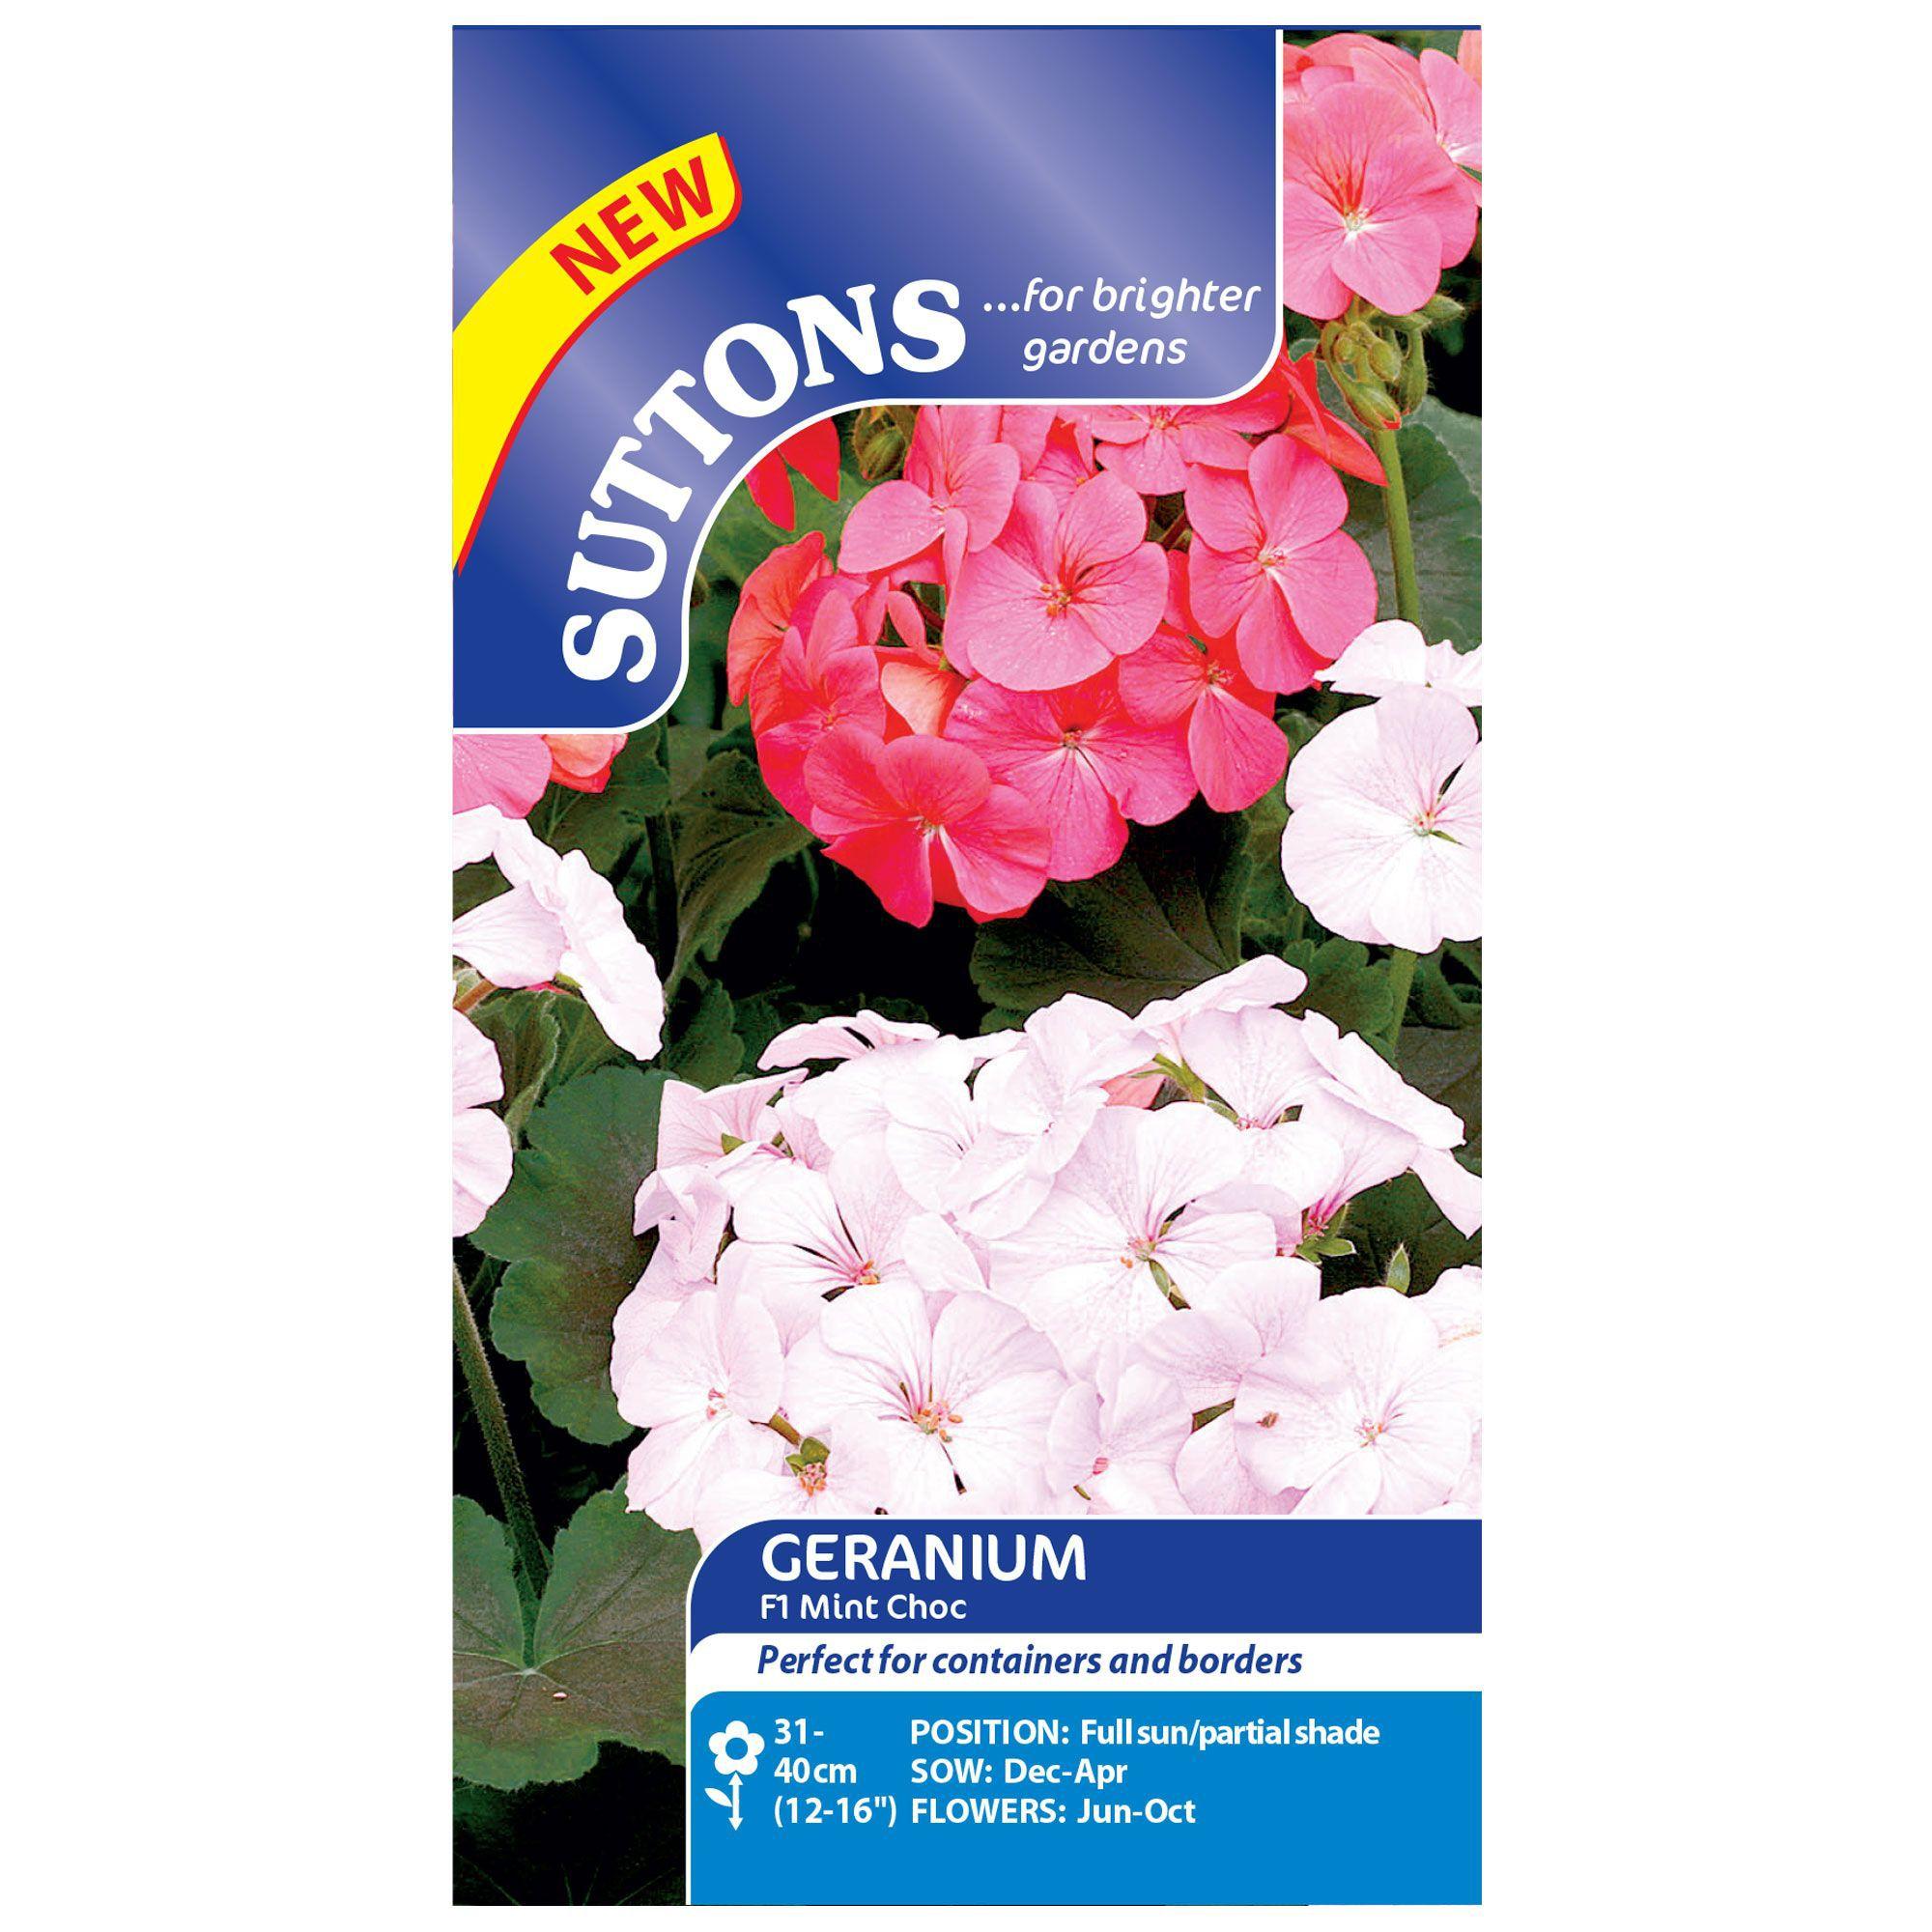 Suttons Geranium Seeds, F1 Mint Choc